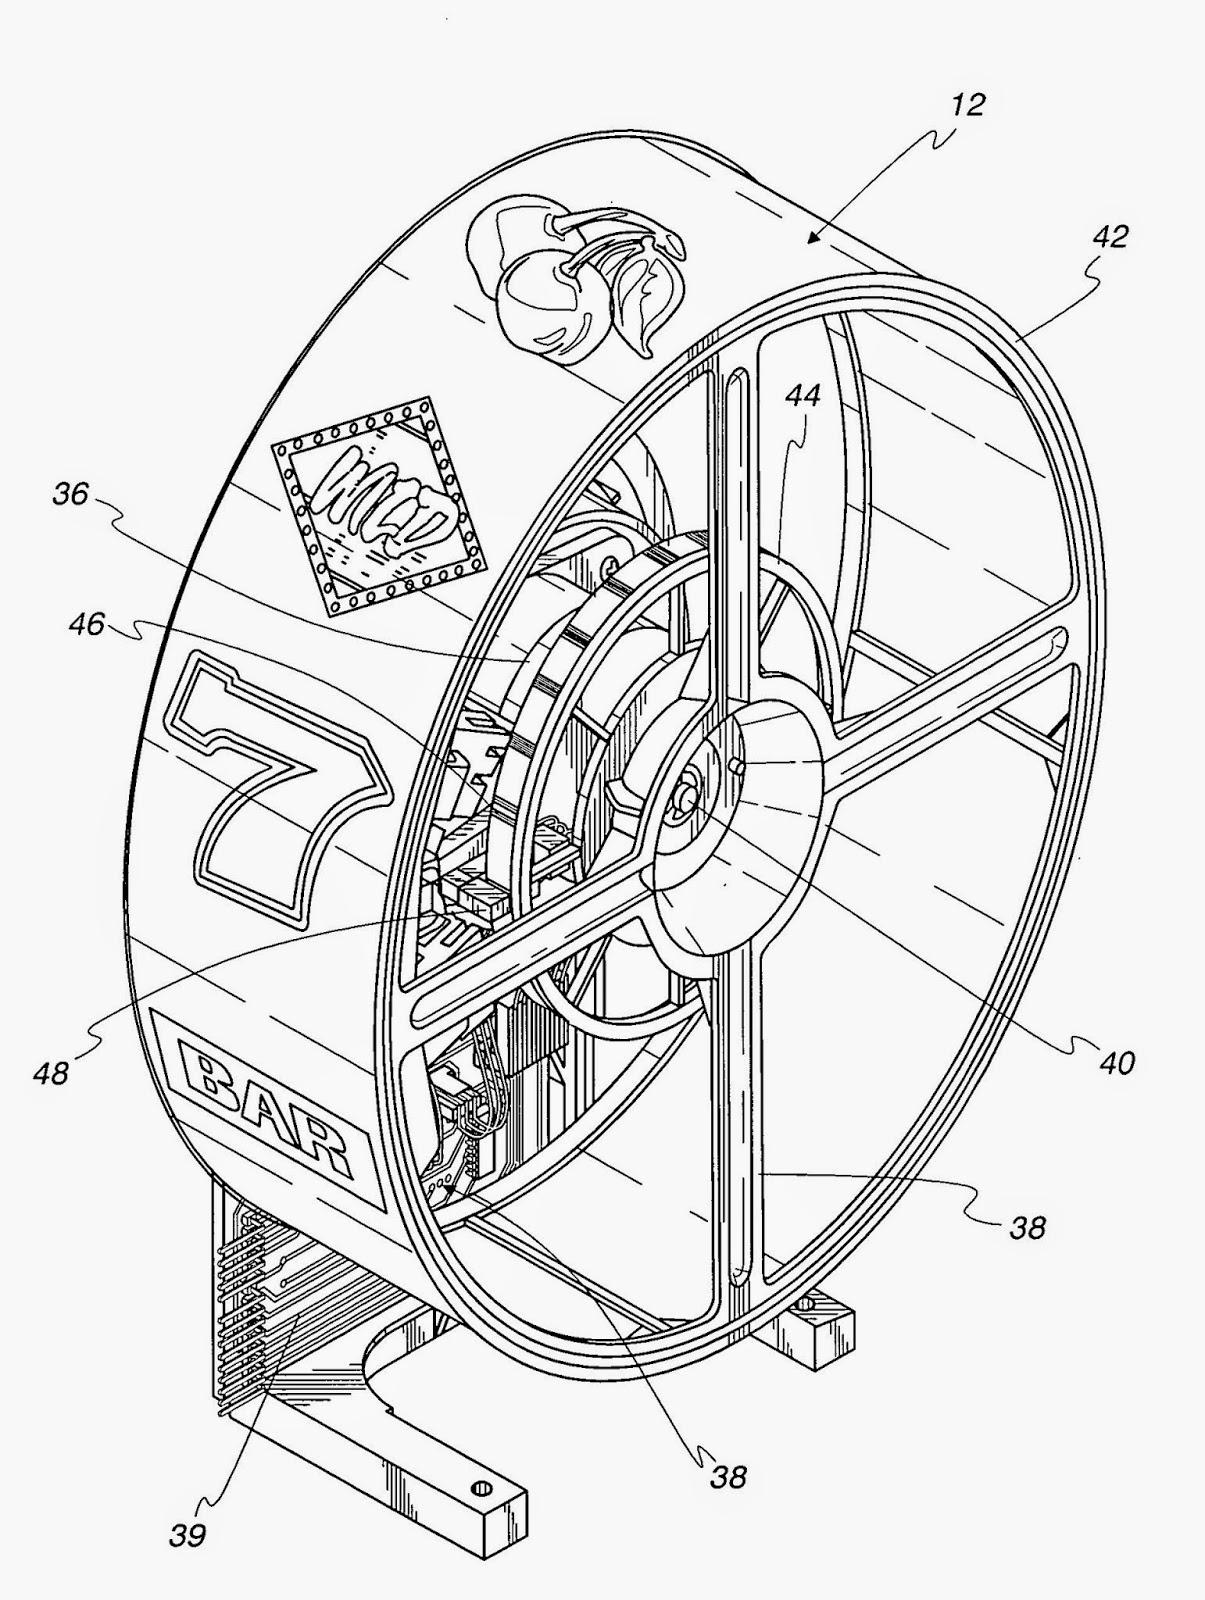 Yamaha R6 Wiring Diagram Yamaha R Wiring Diagram A